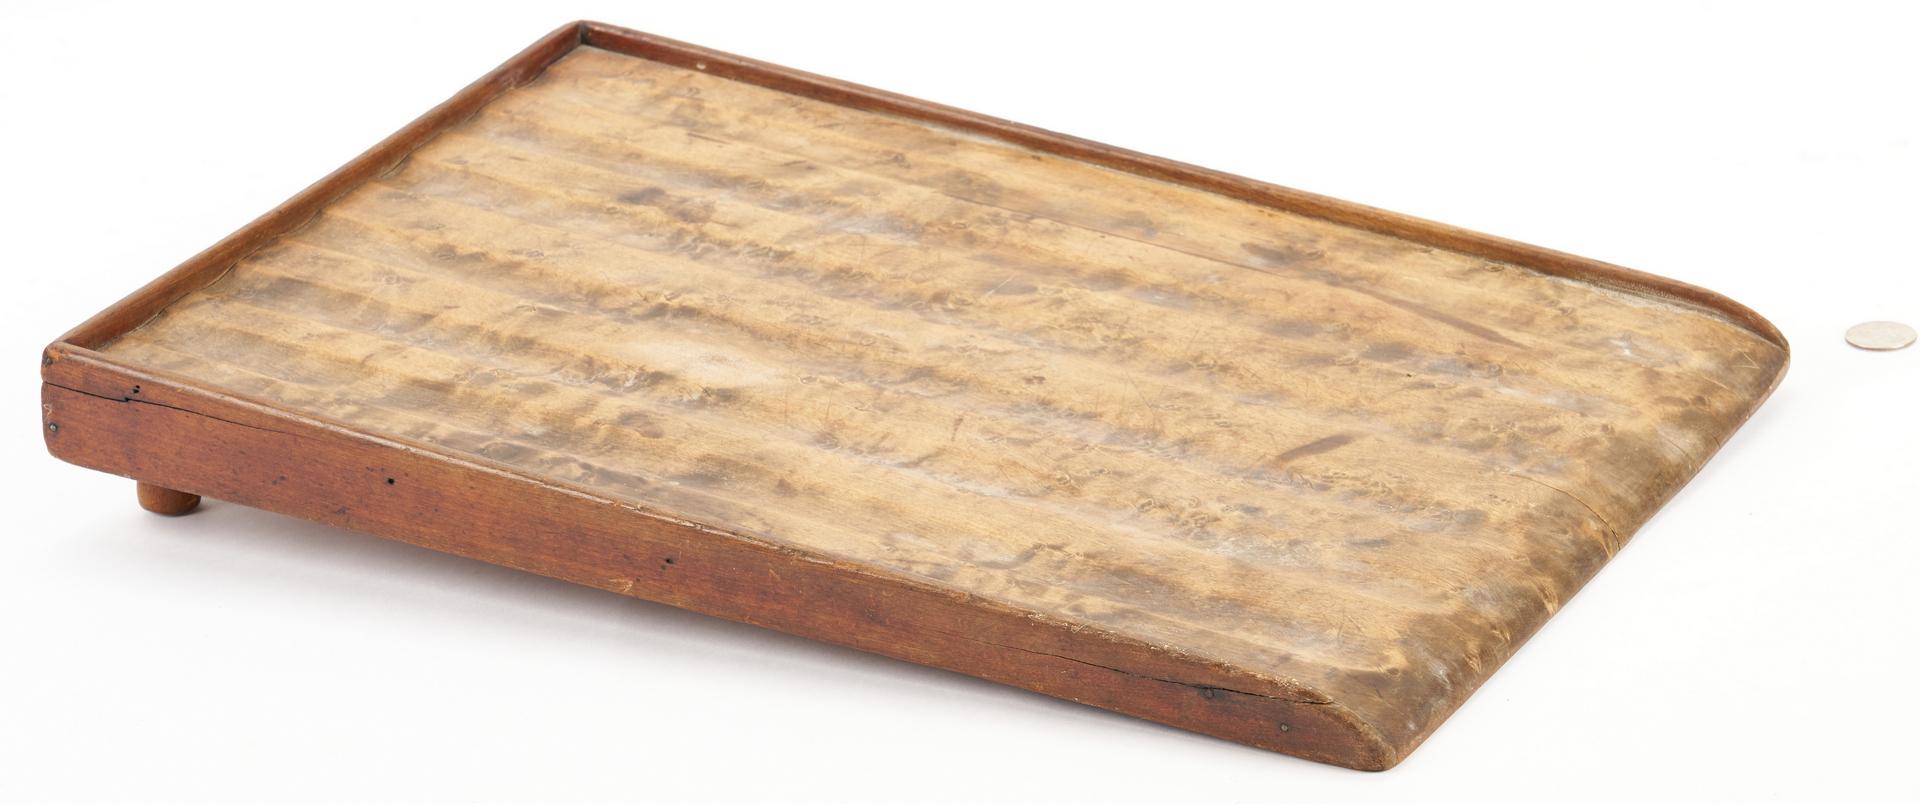 Lot 390: 3 Cutting Boards incl. Bird's Eye Maple